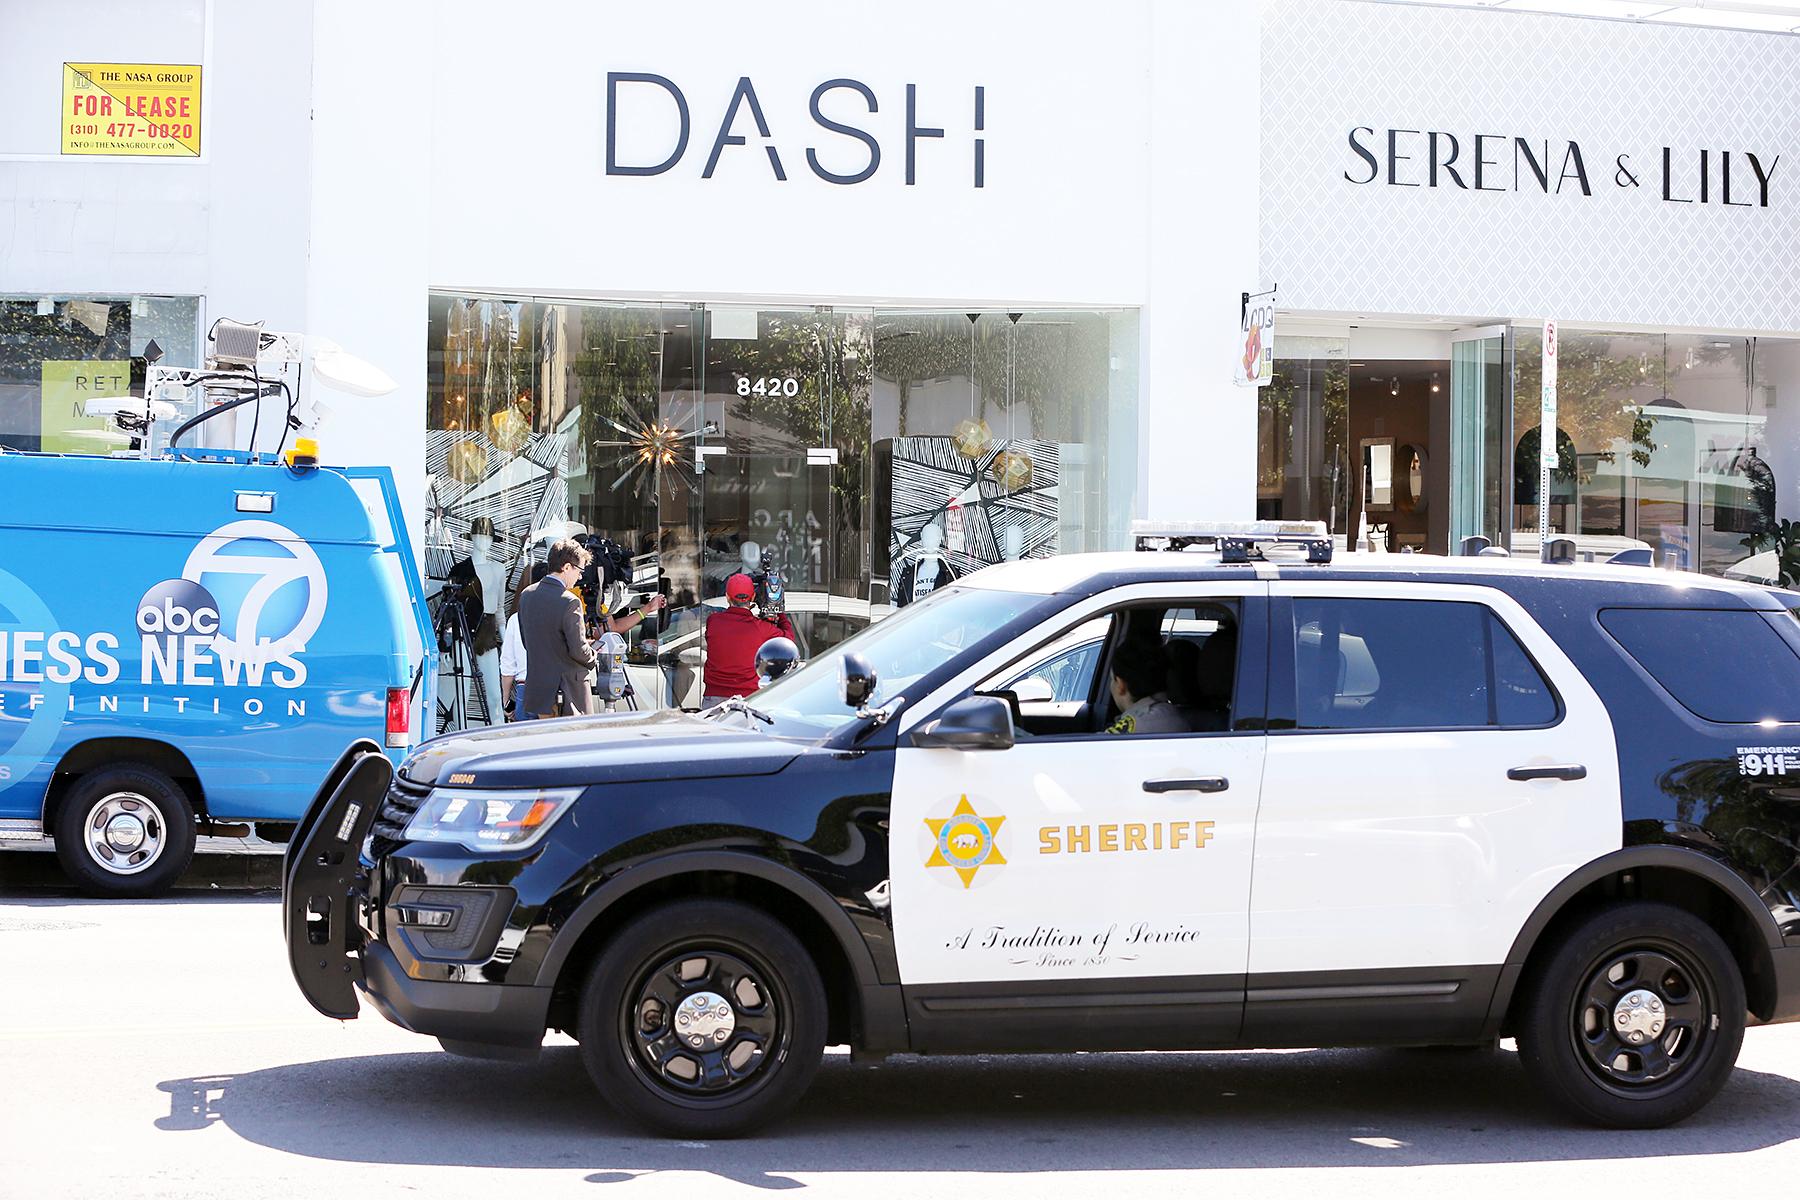 Machete Dash store Kardashians